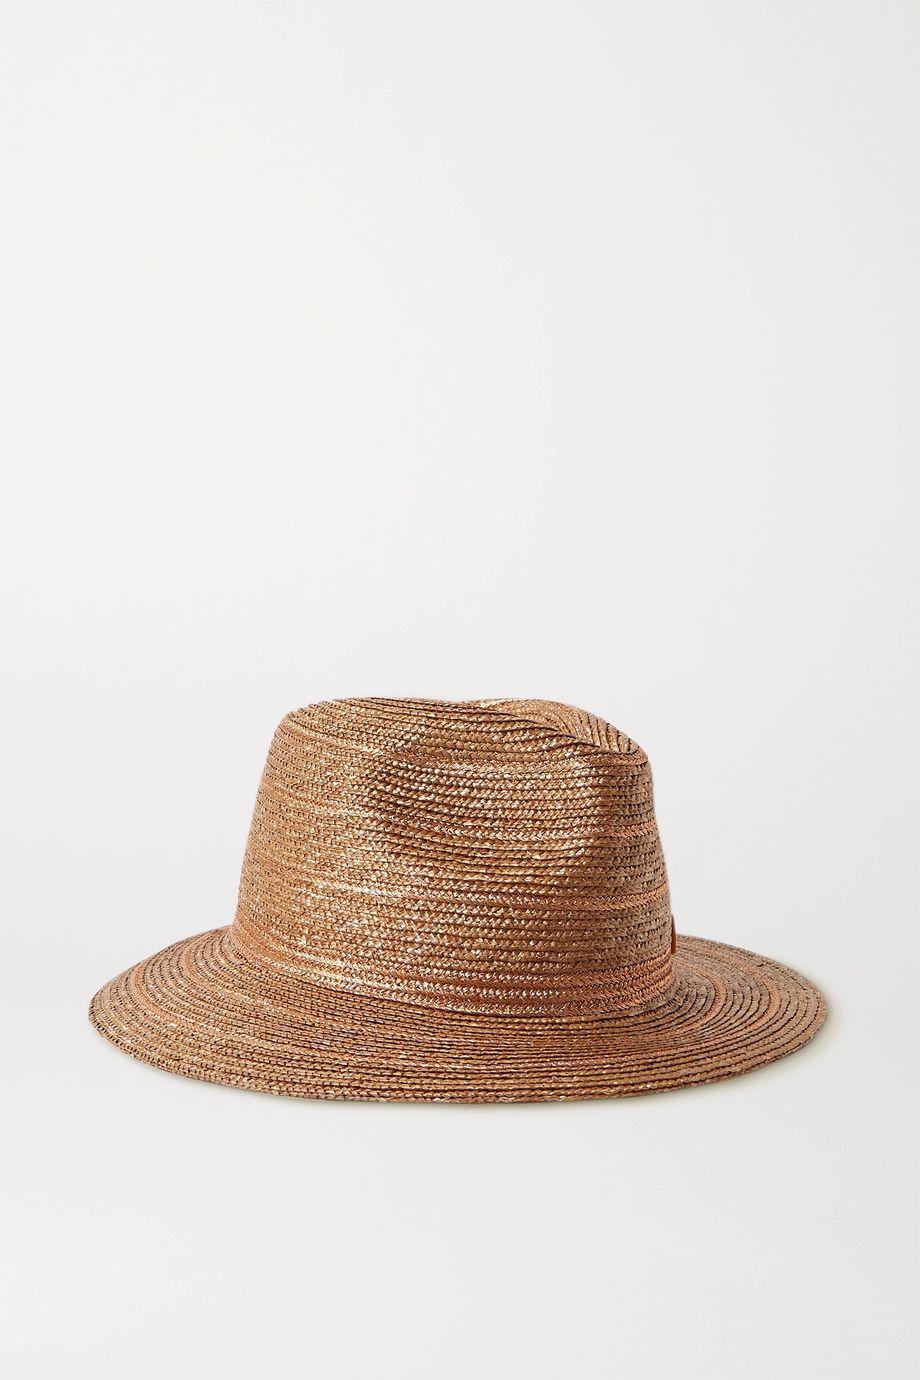 Maison Michel Rico 金属感边饰浅顶卷檐草帽